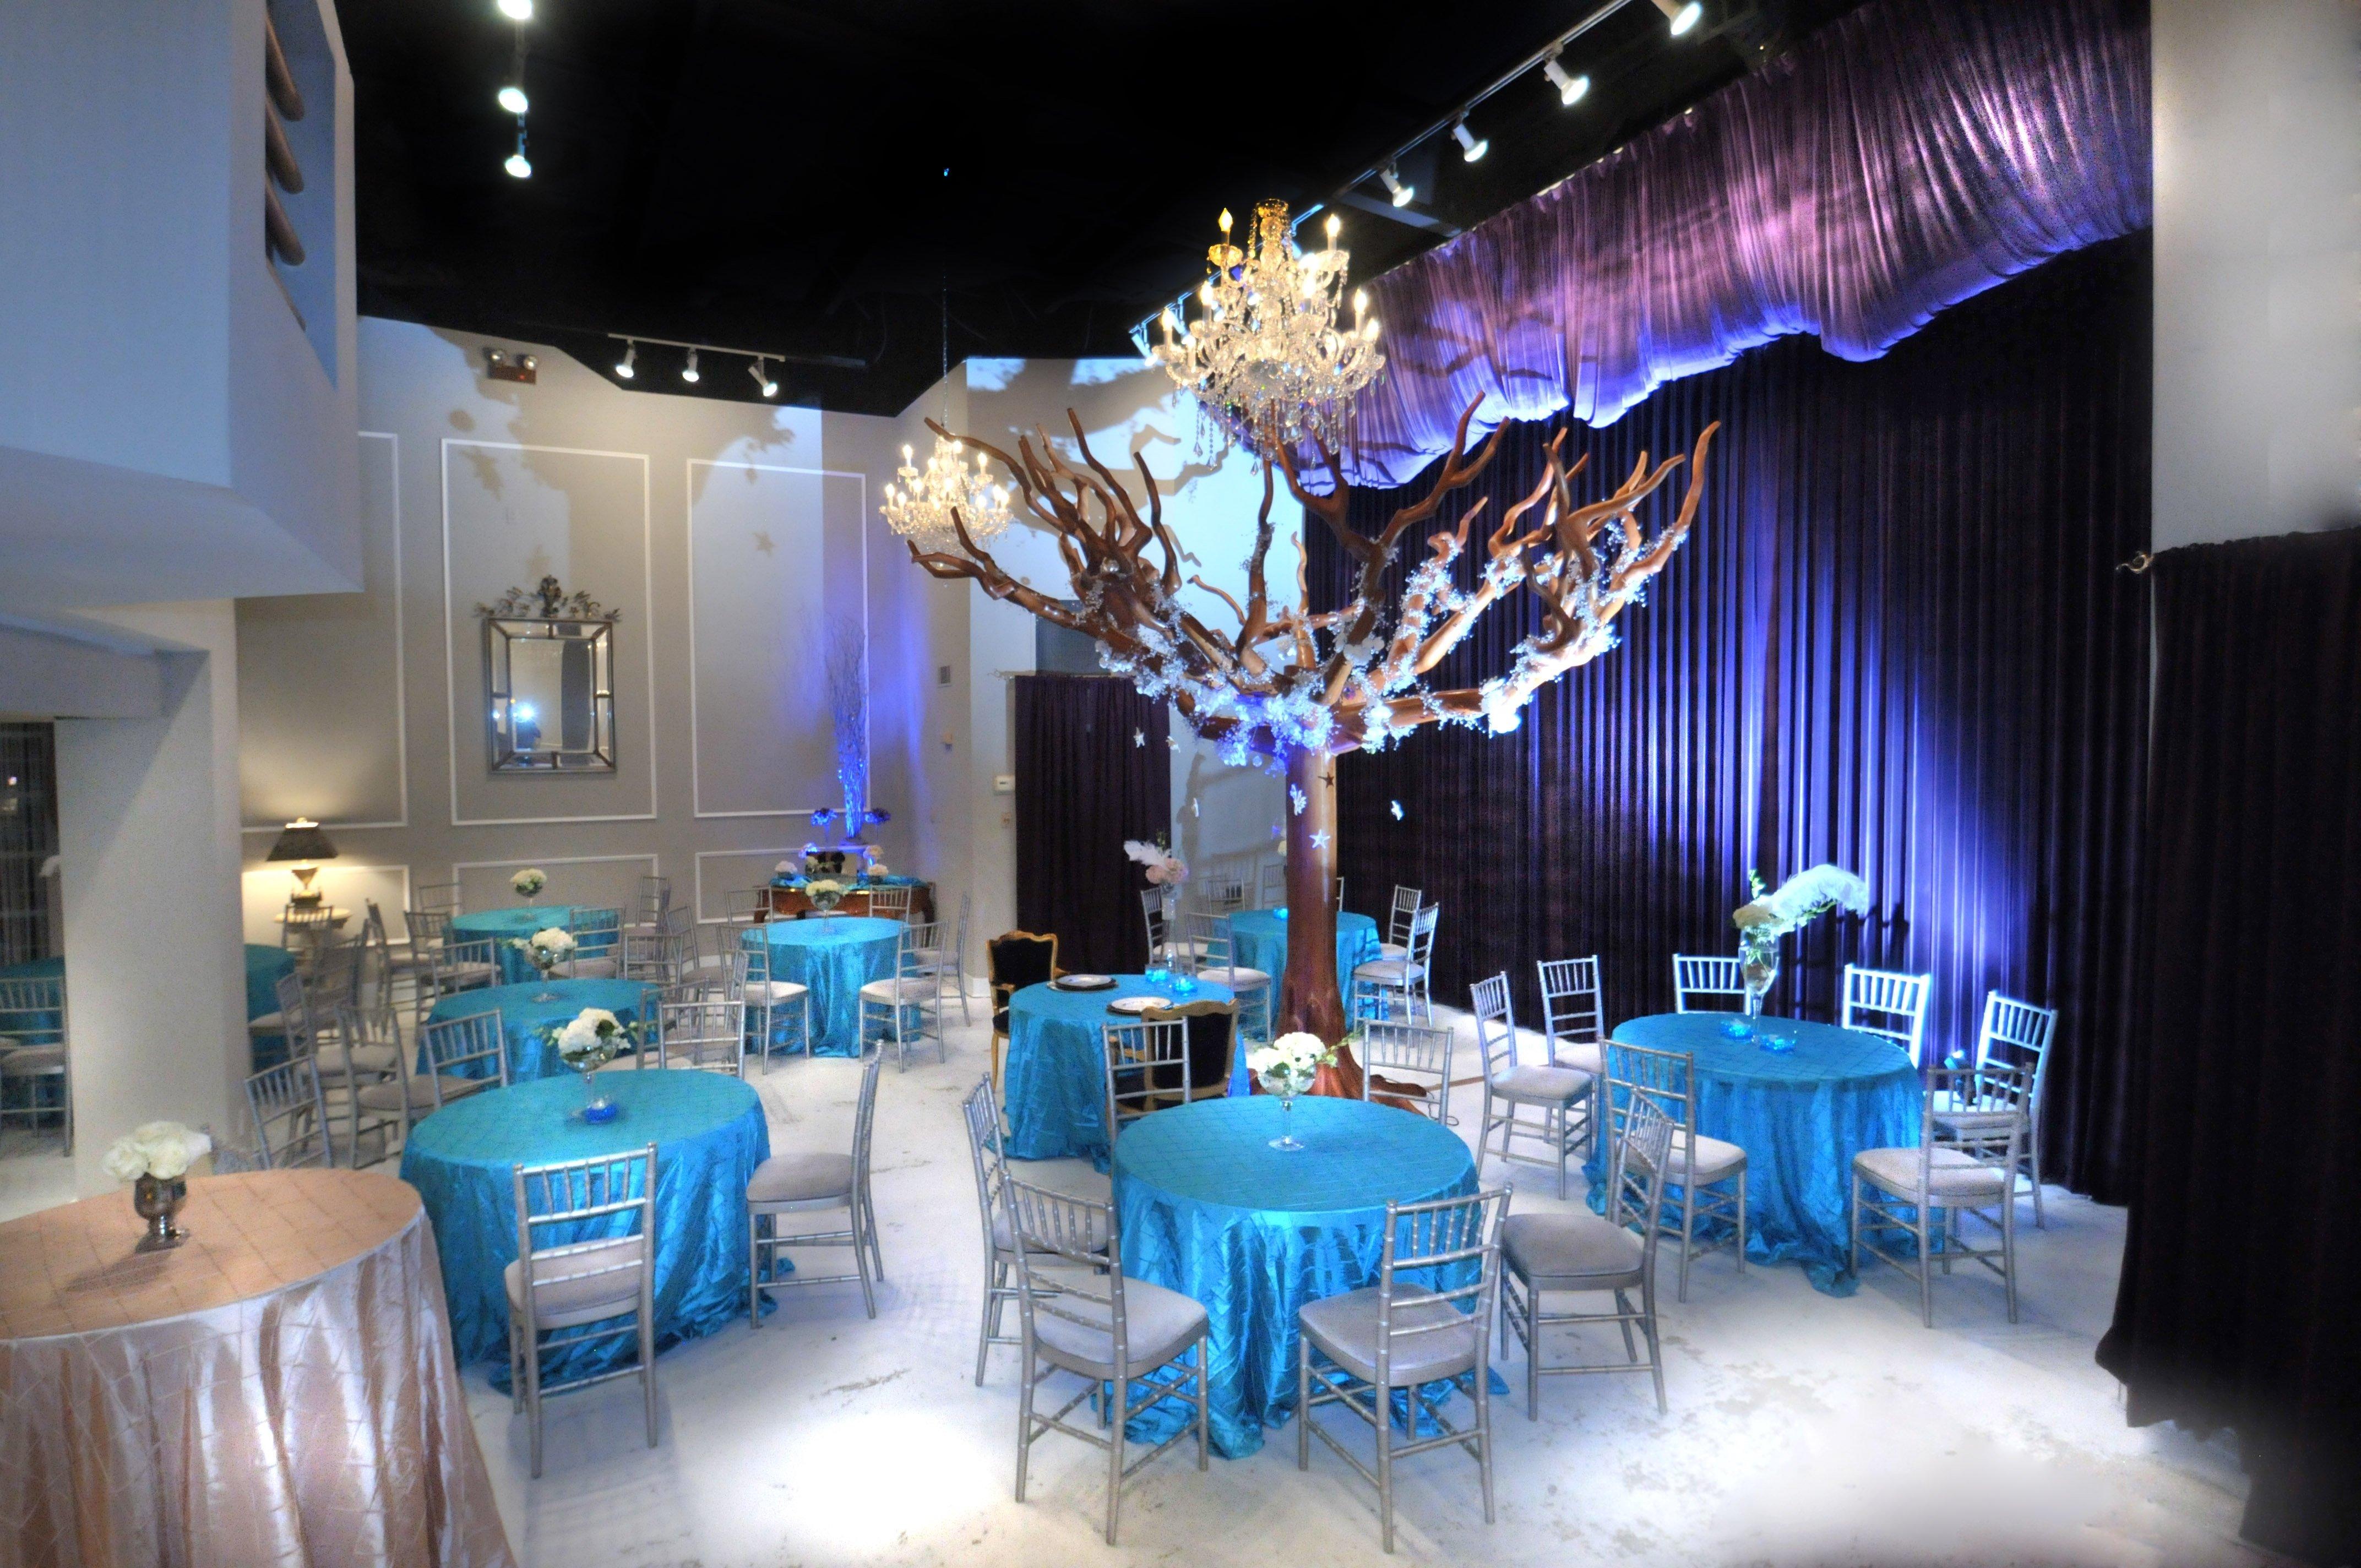 10 Stylish Beach Theme Wedding Reception Ideas south beach theme archives wedding venues le bam studio all plus 2020